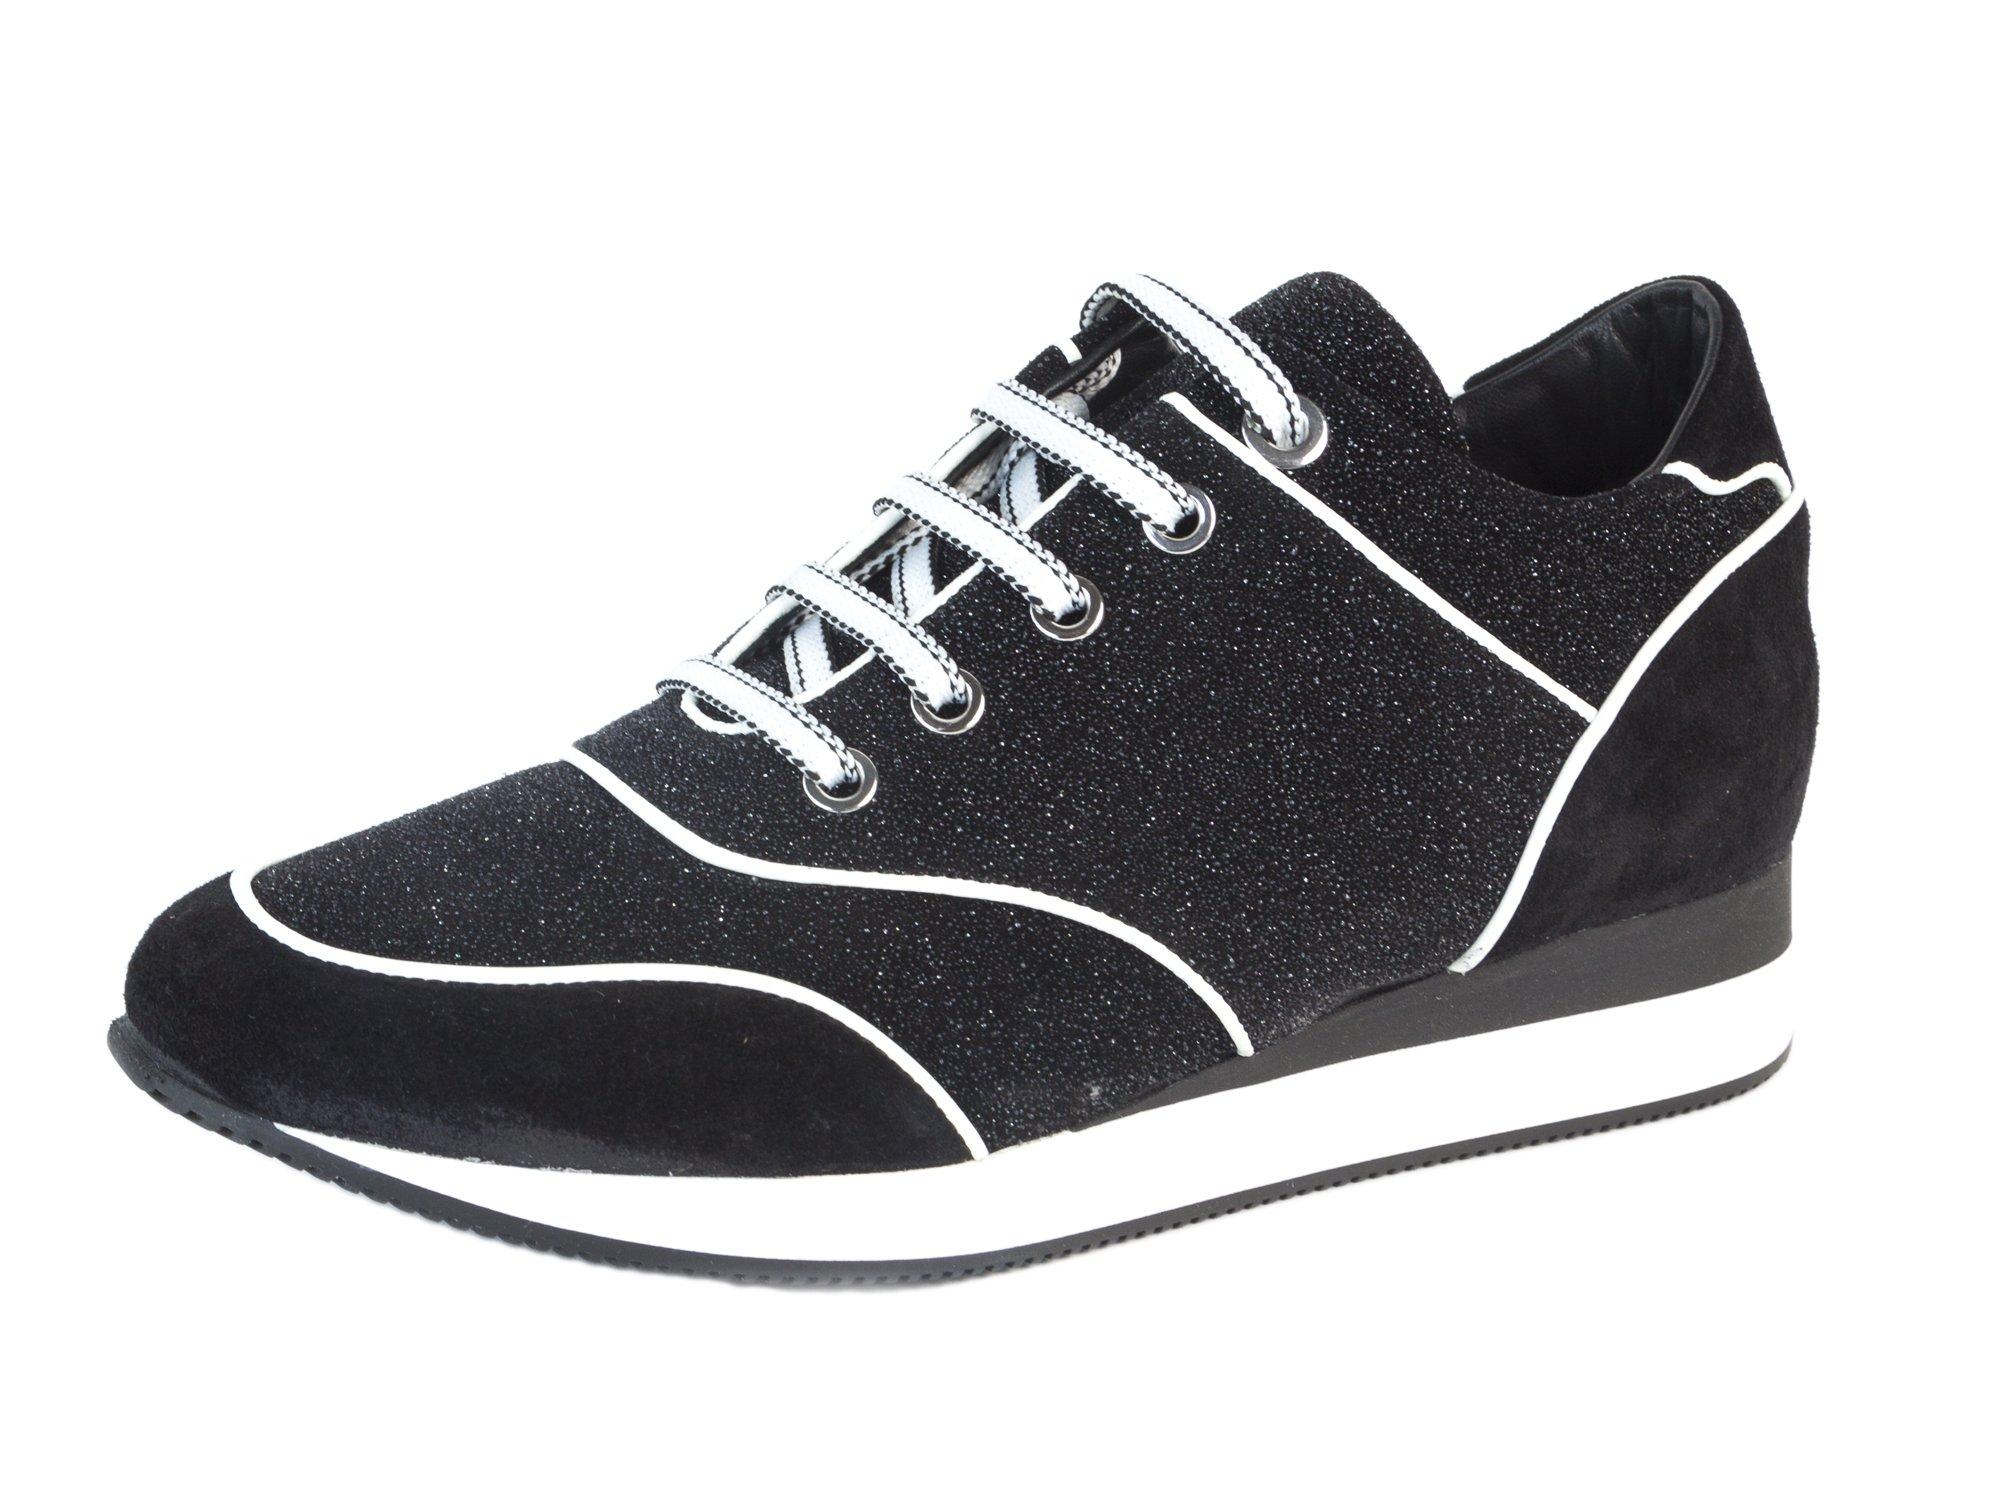 MaxMara Women's MM32 Embellished Leather Sneakers US 7/IT 37 Black